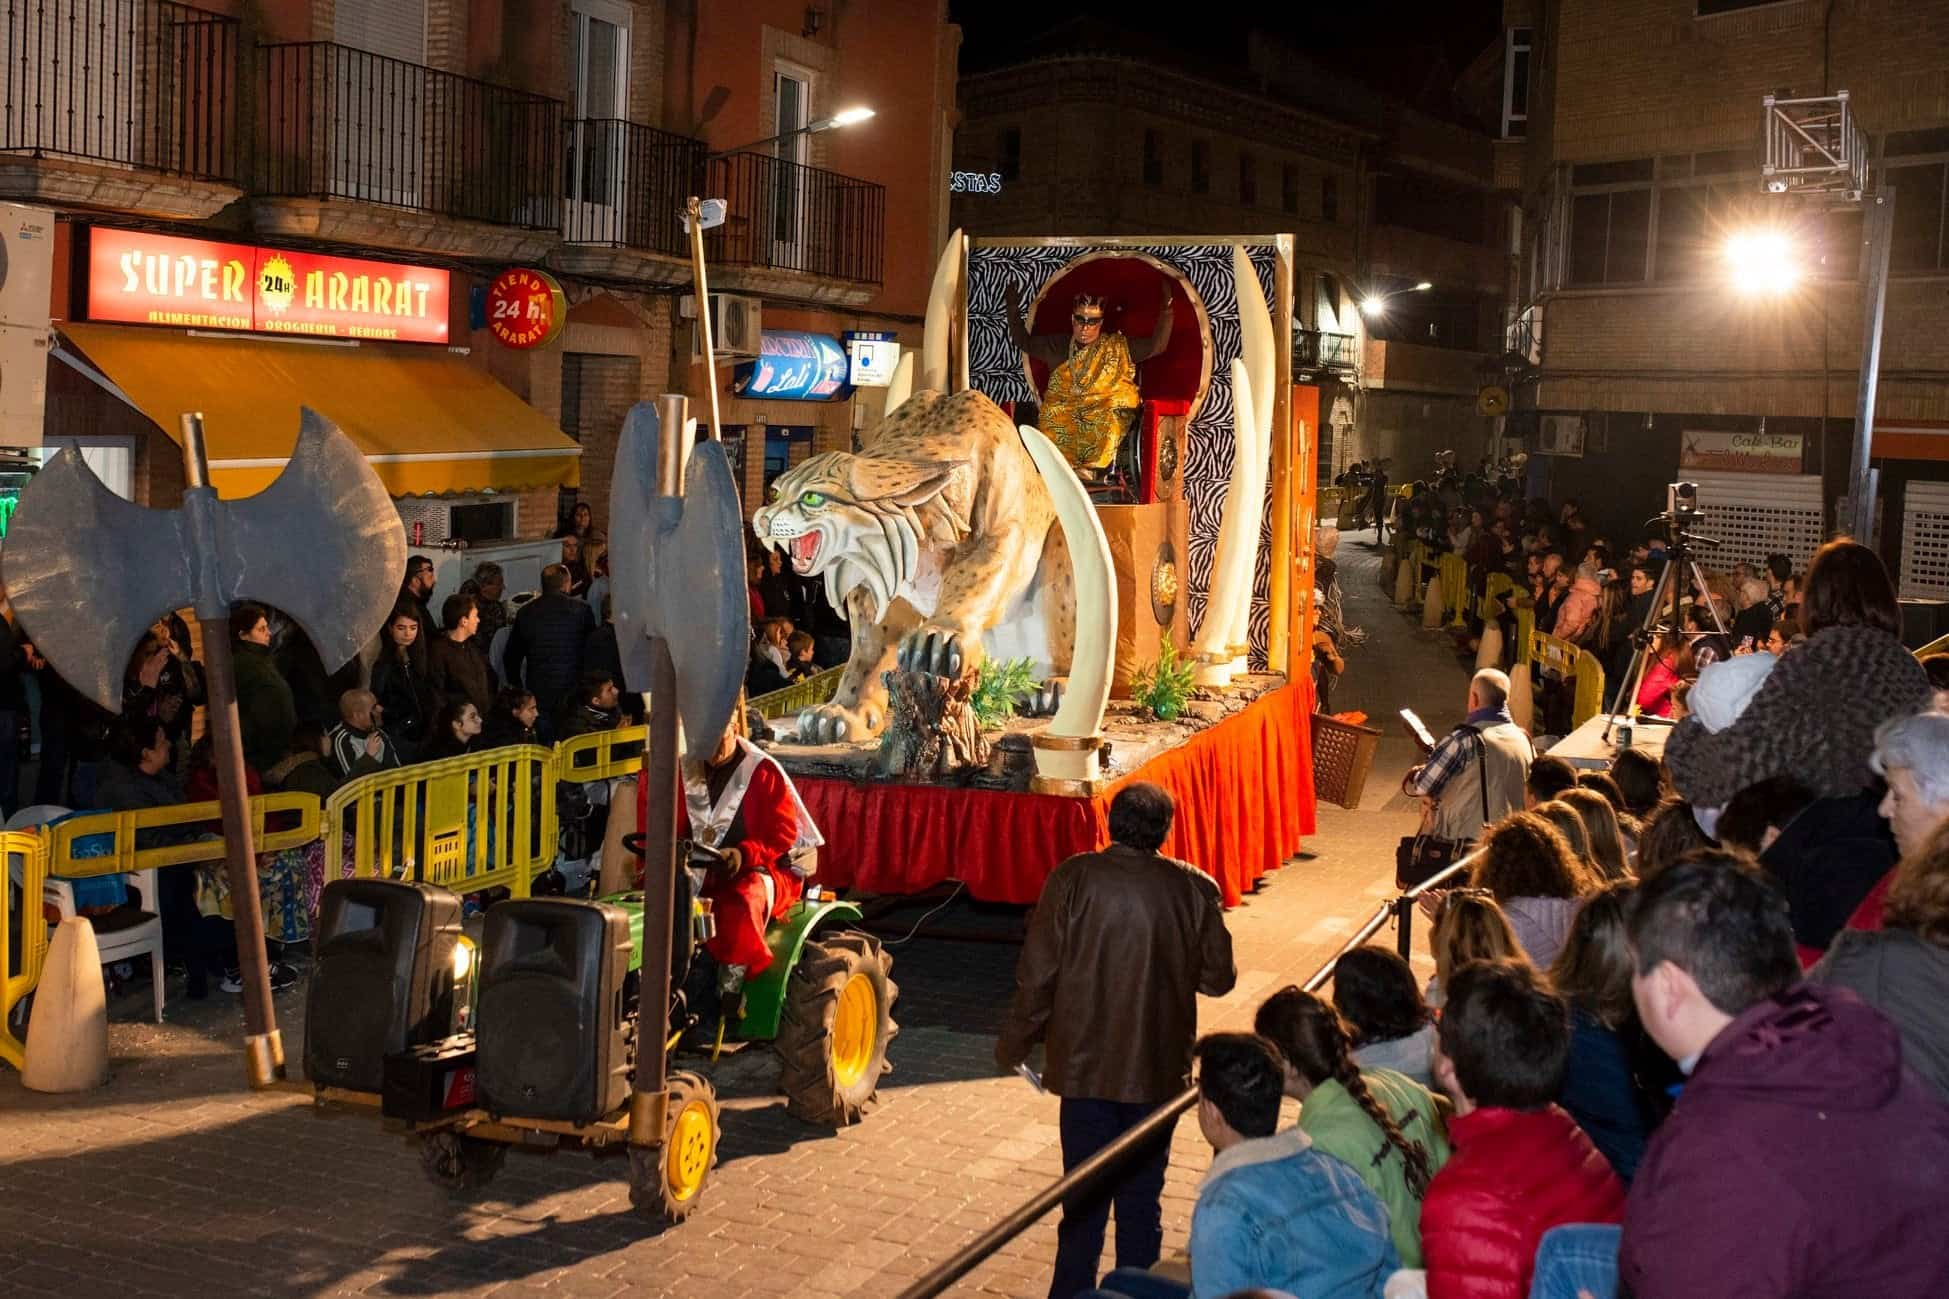 Carnaval de herencia 2020 ofertorio 141 - Selección de fotografías del Ofertorio del Carnaval de Herencia